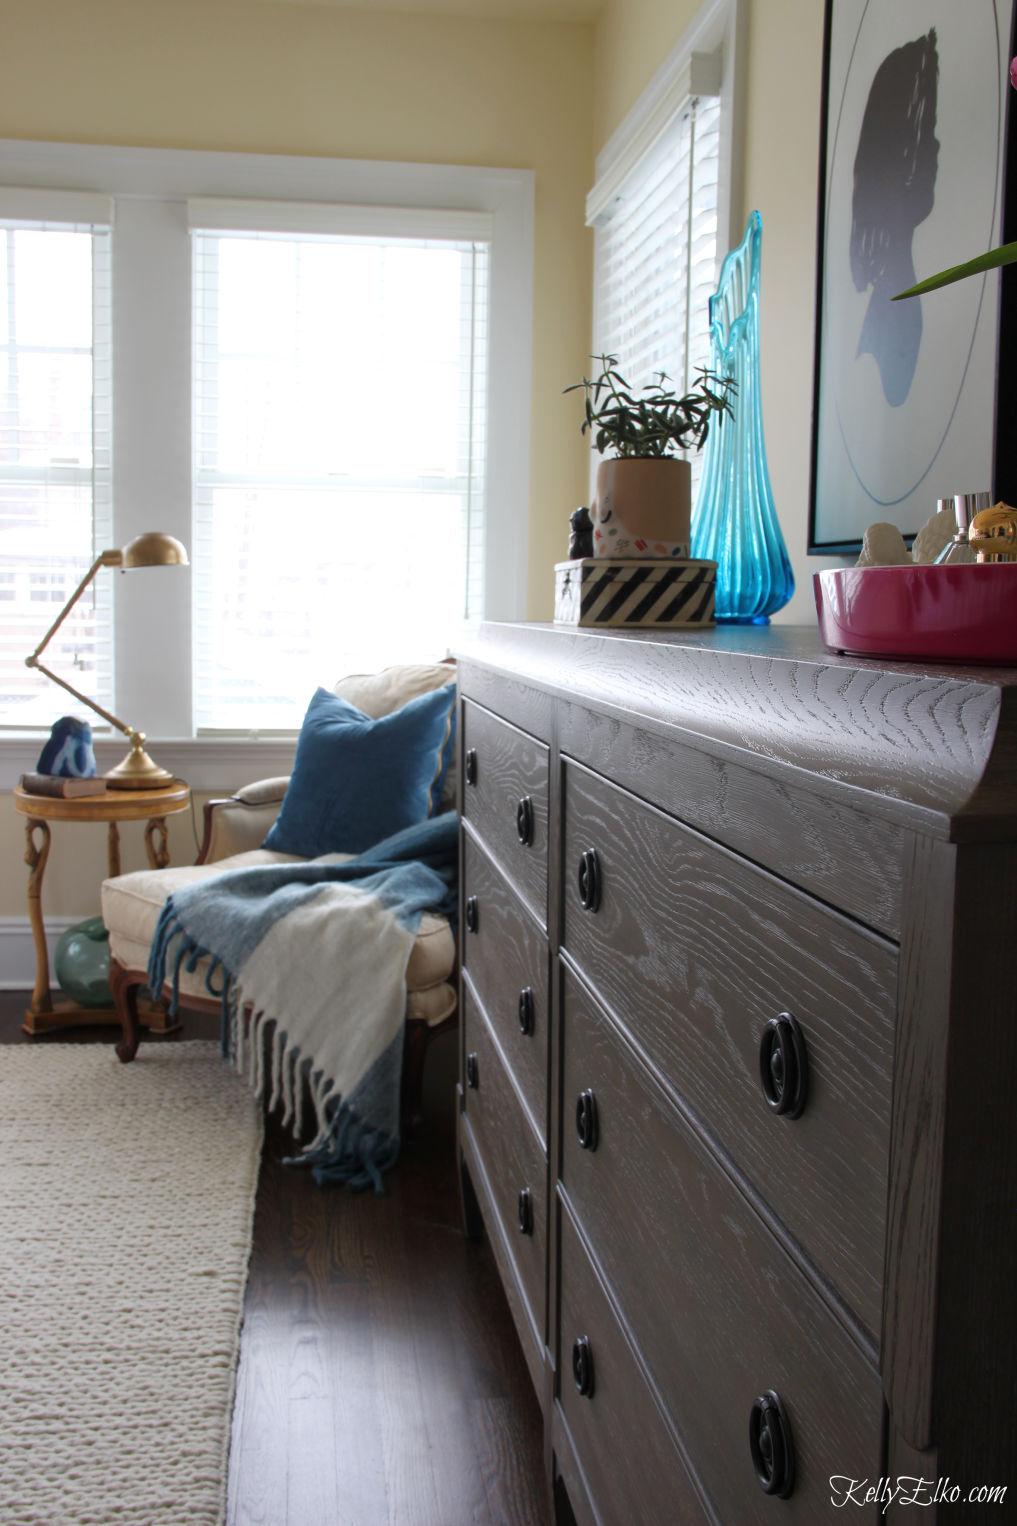 Beautiful master bedroom kellyelko.com #bedroom #masterbedroom #bedroomfurniture #bedroomdecor #dresser